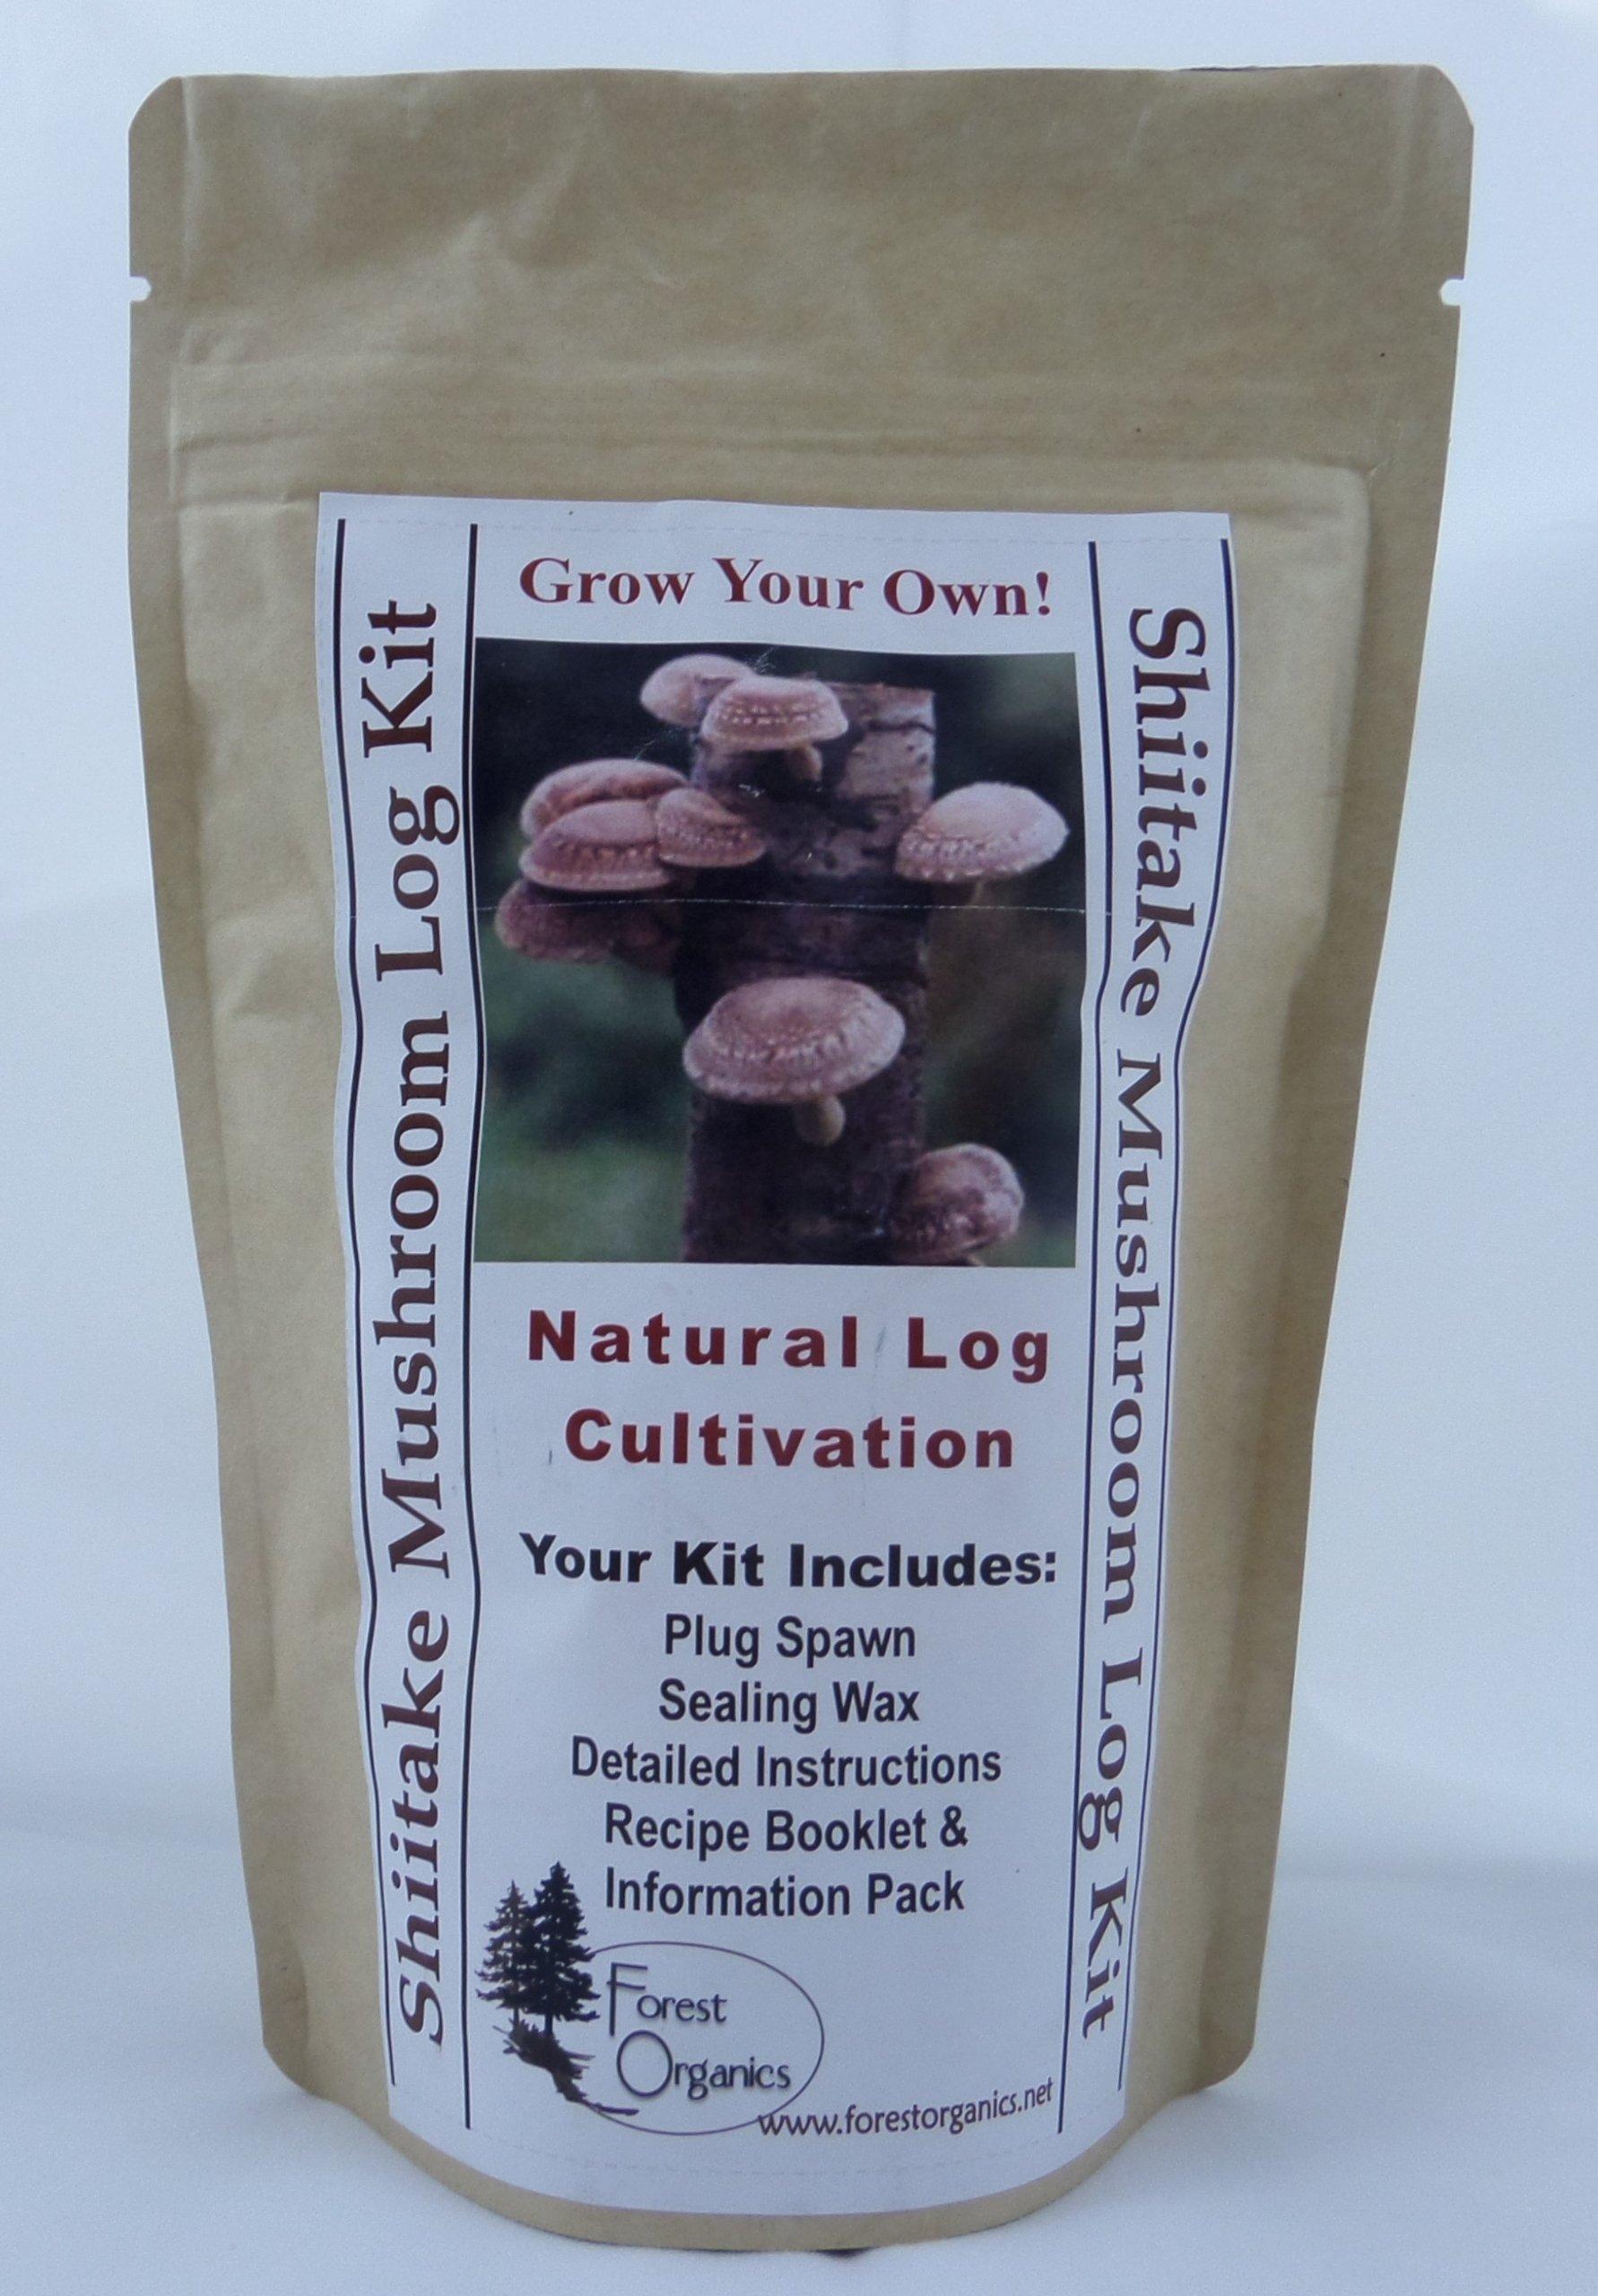 Forest Organics Shiitake Mushroom Growing Log Kit Cancer Fighting Grows For Years!